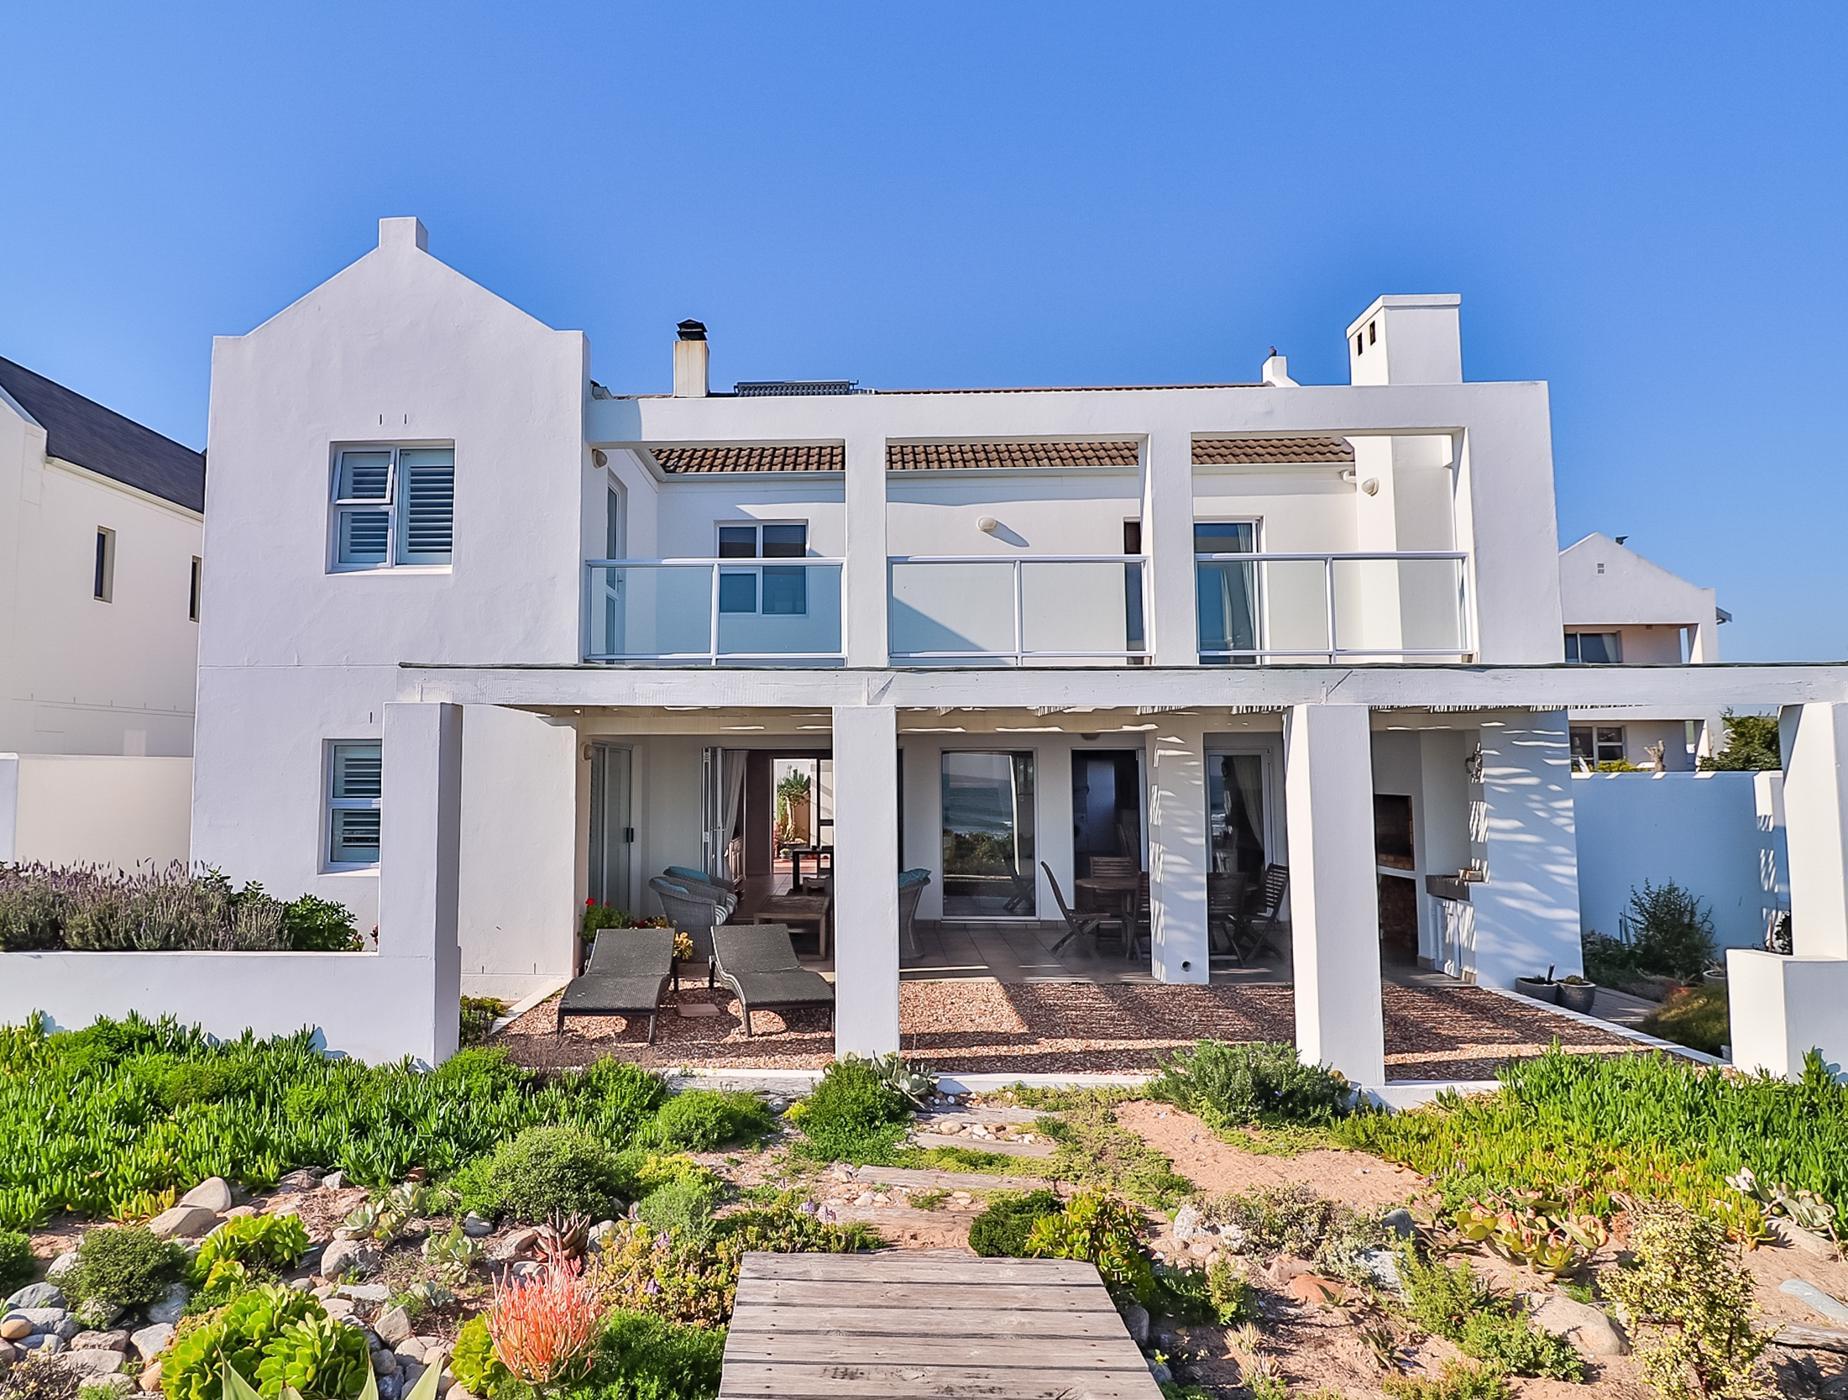 4 bedroom house for sale in Britannia Bay